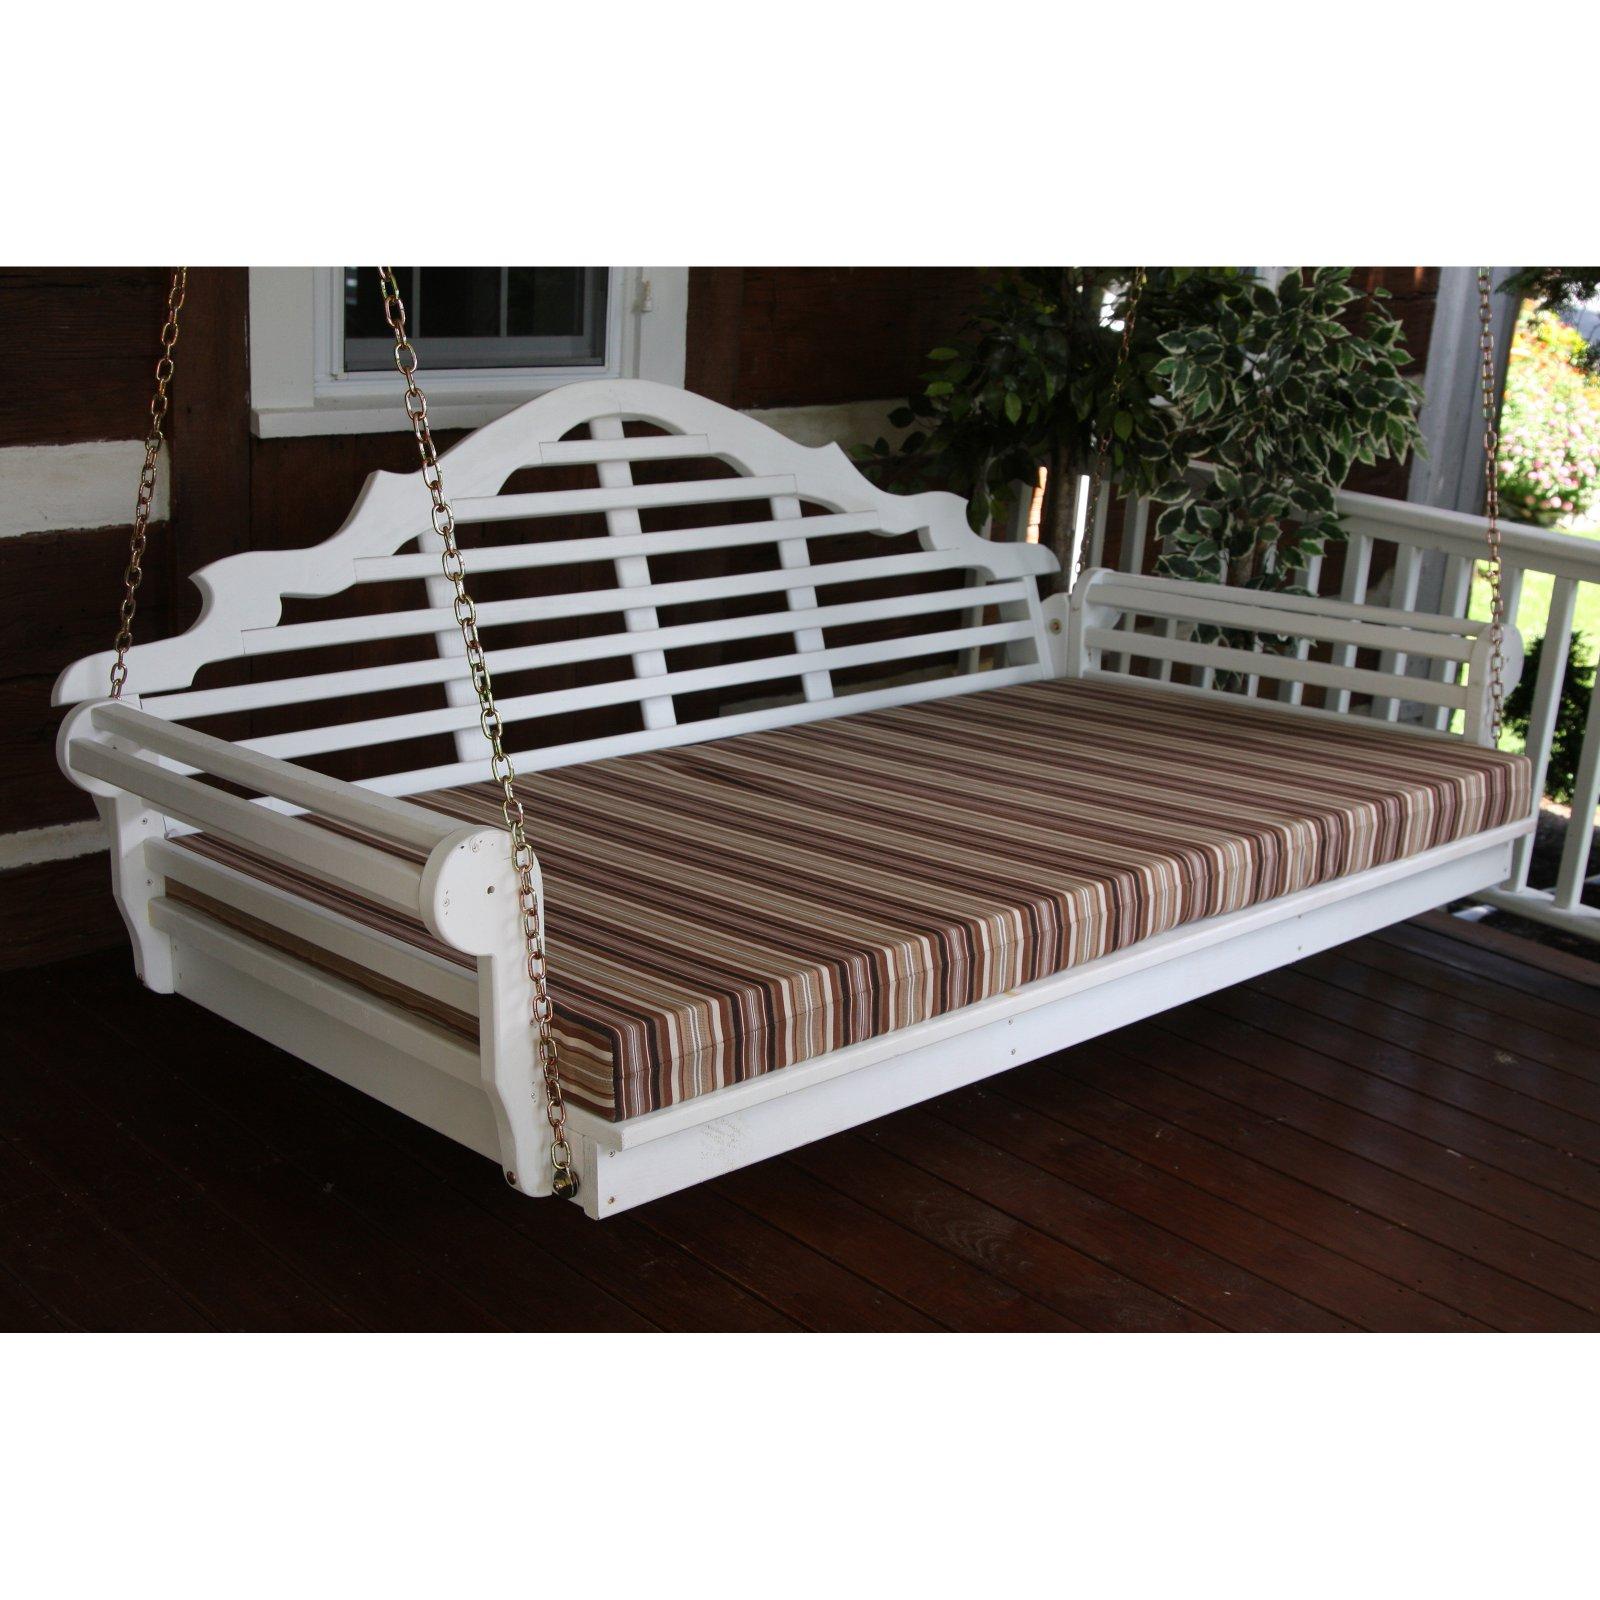 A & L Furniture Yellow Pine Marlboro XL Swing Bed - Holds Twin Size Mattress